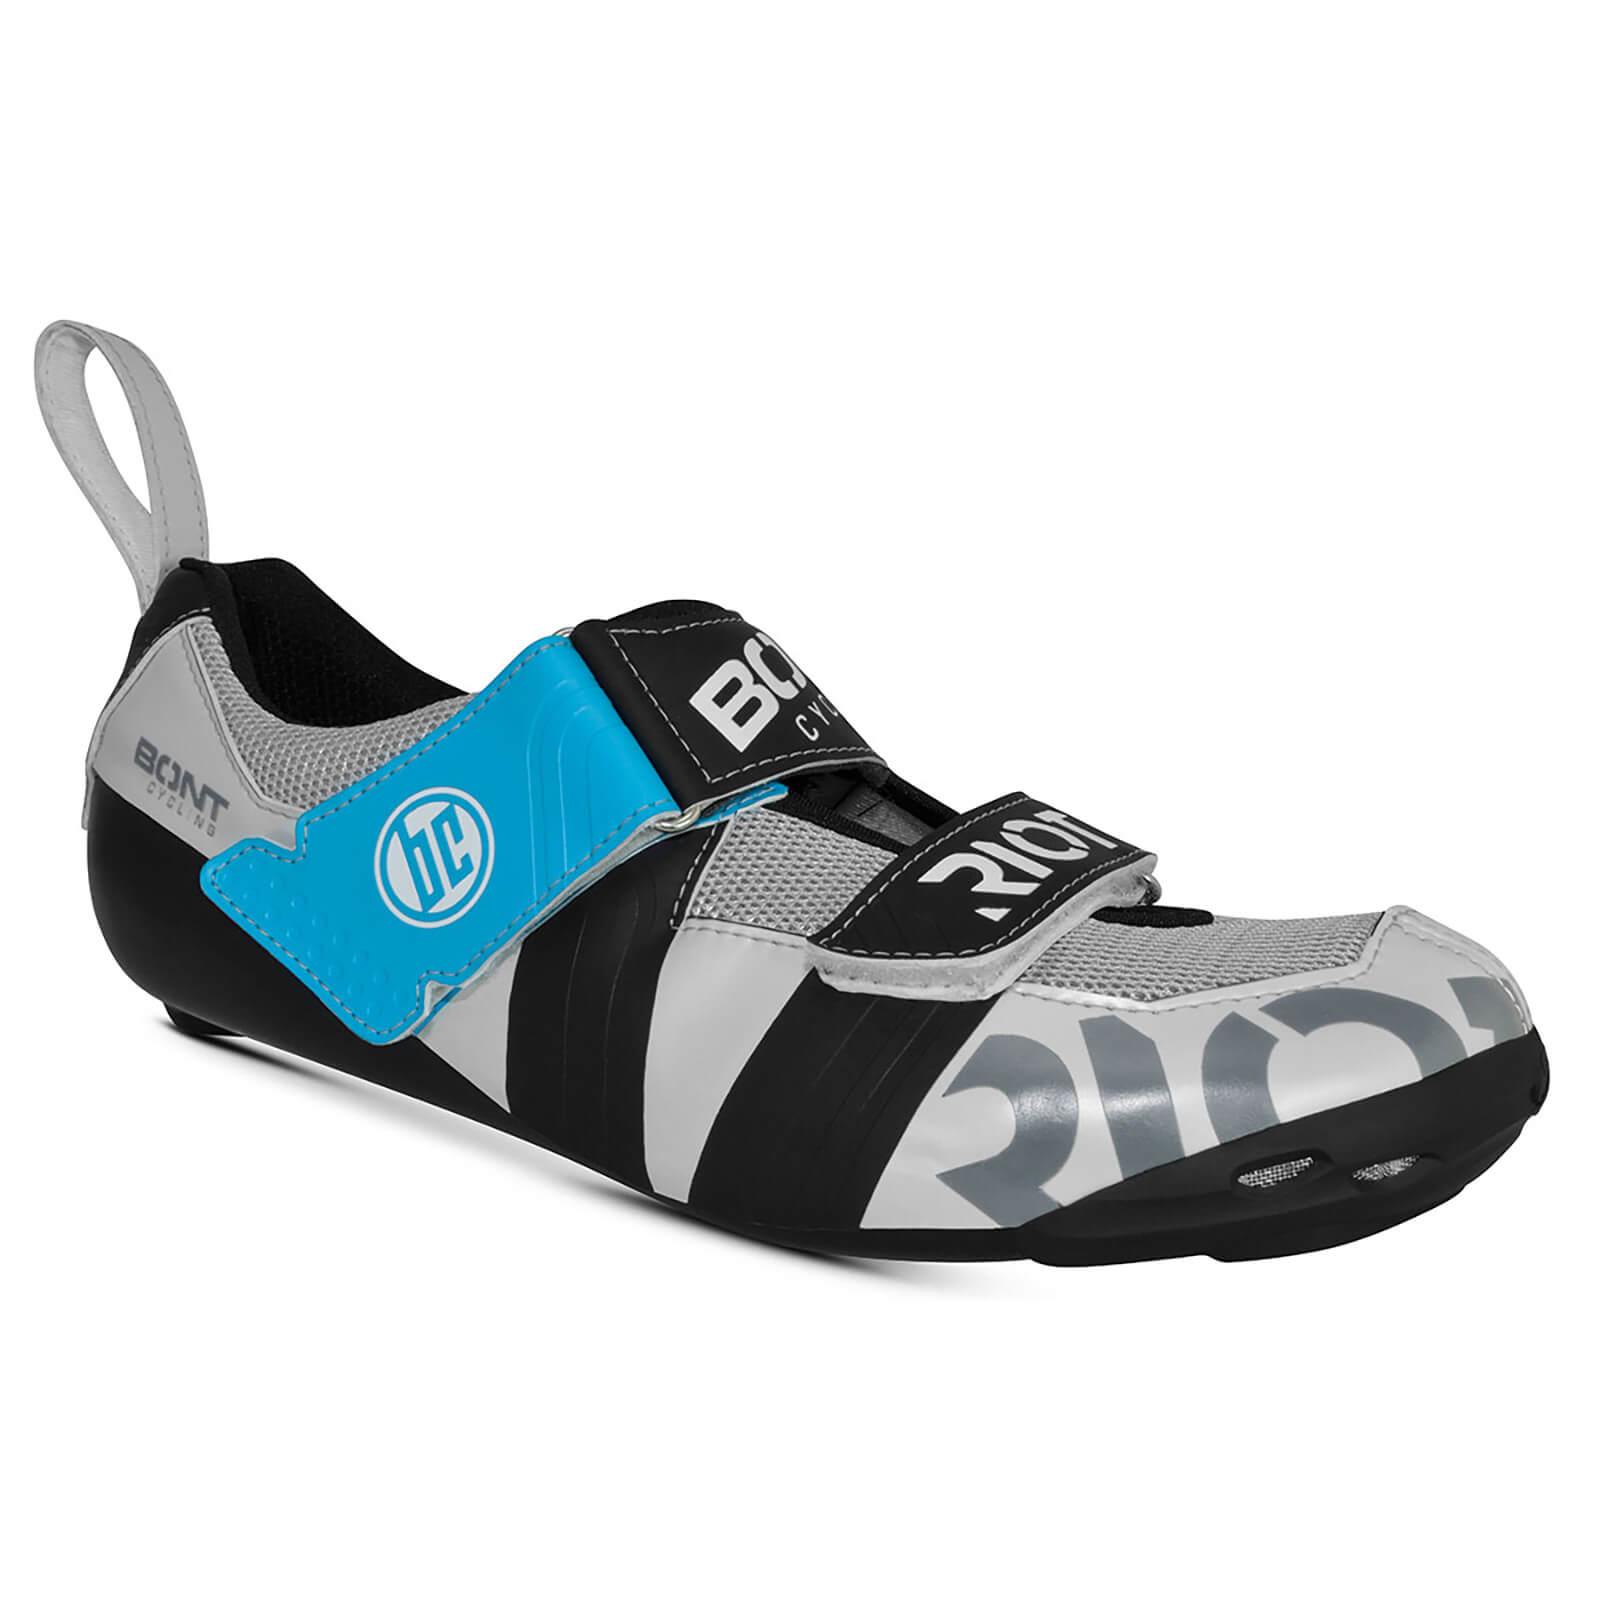 Bont Riot TR+ Road Shoes - EU 42 - White/Black